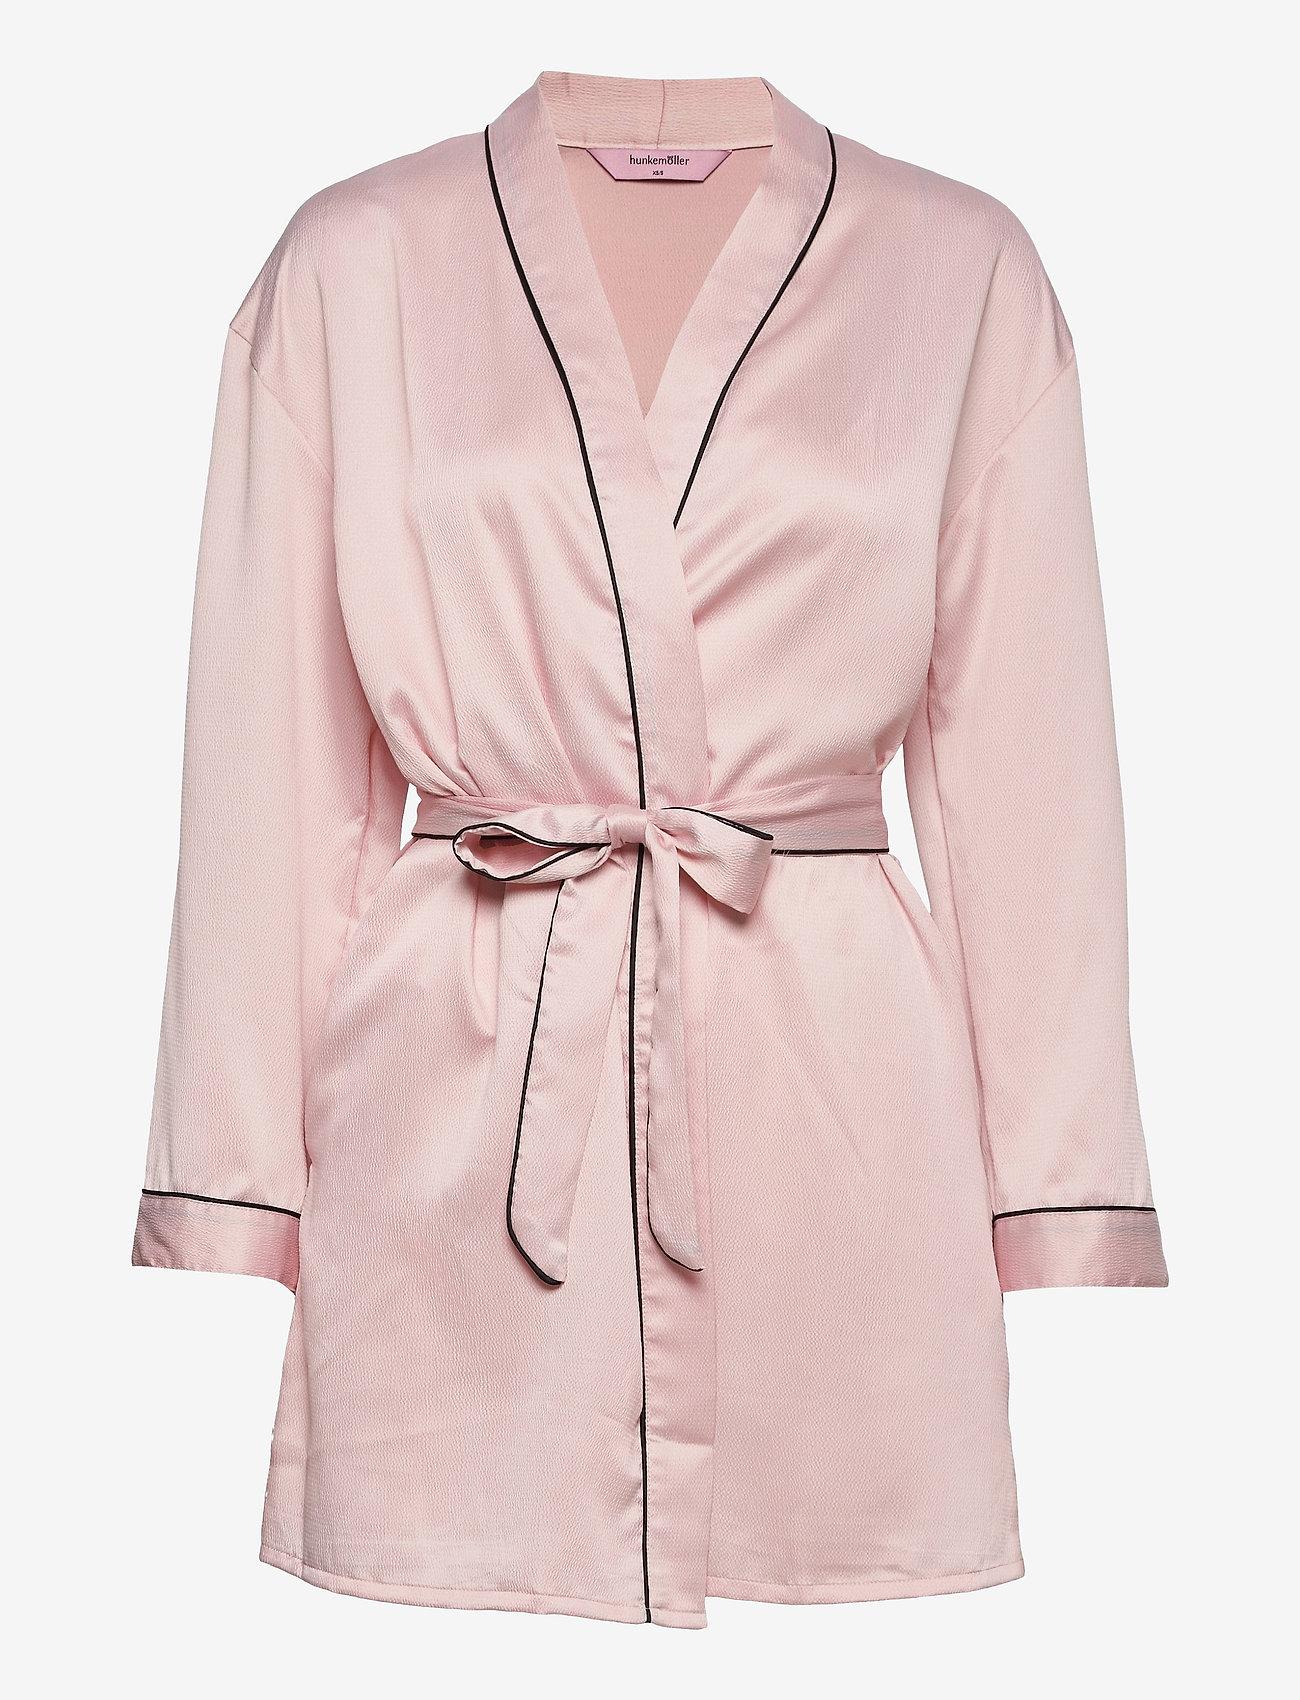 Hunkemöller - Kimono Hammered Satin Bow - pegnoirs - peach skin - 0